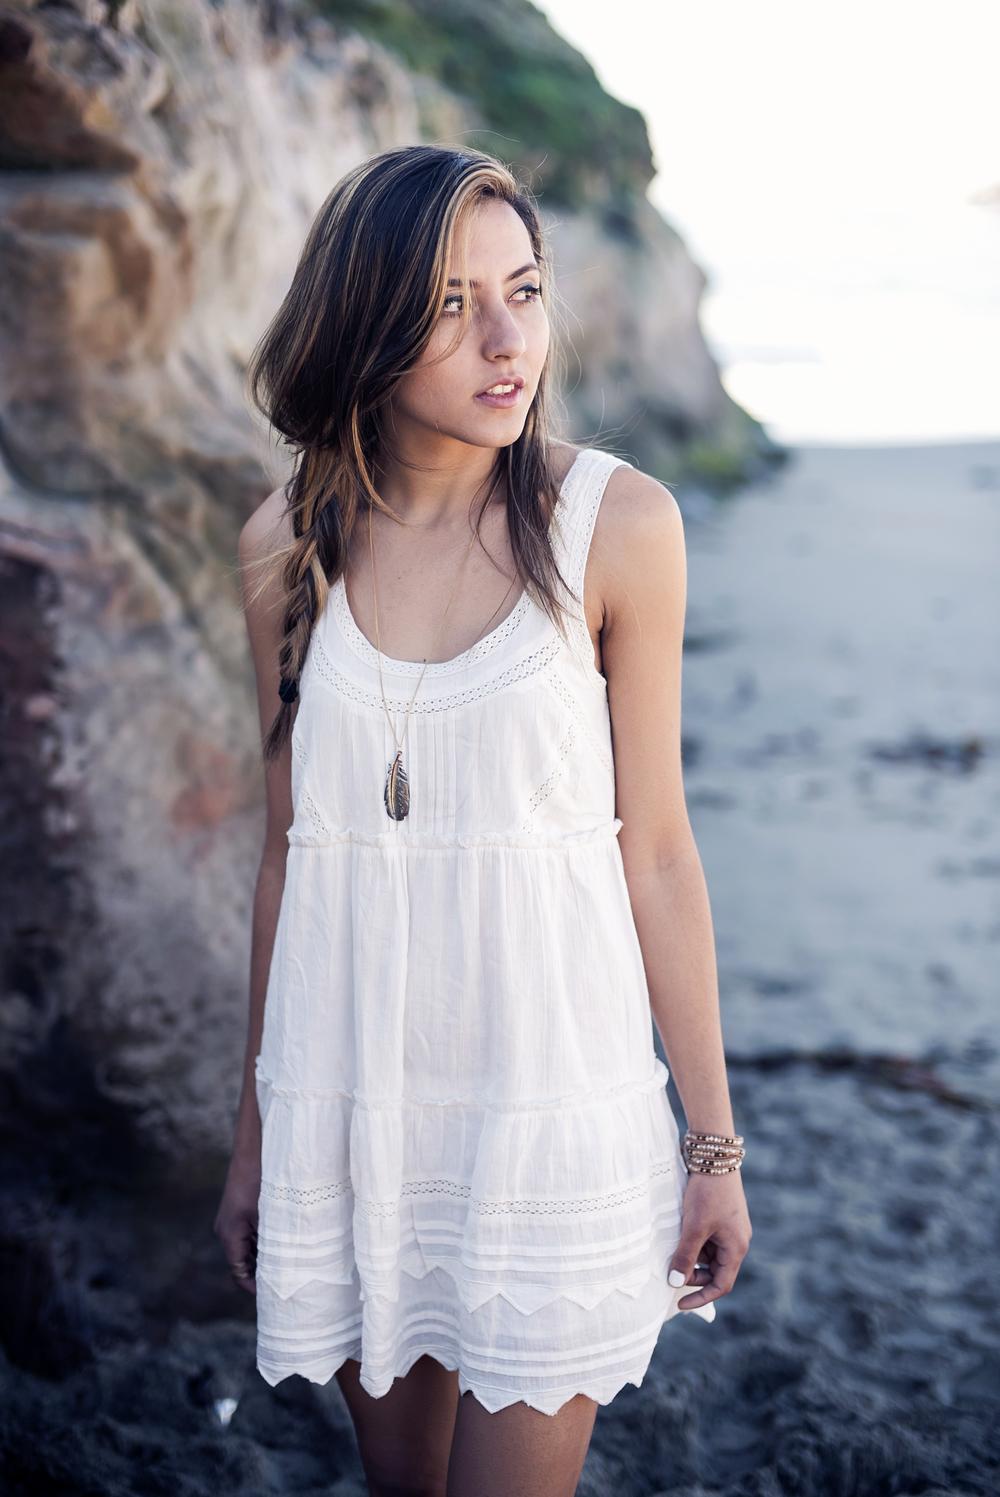 billabong_fade_to_white_dress_fashion_blogger_raquel_paiva